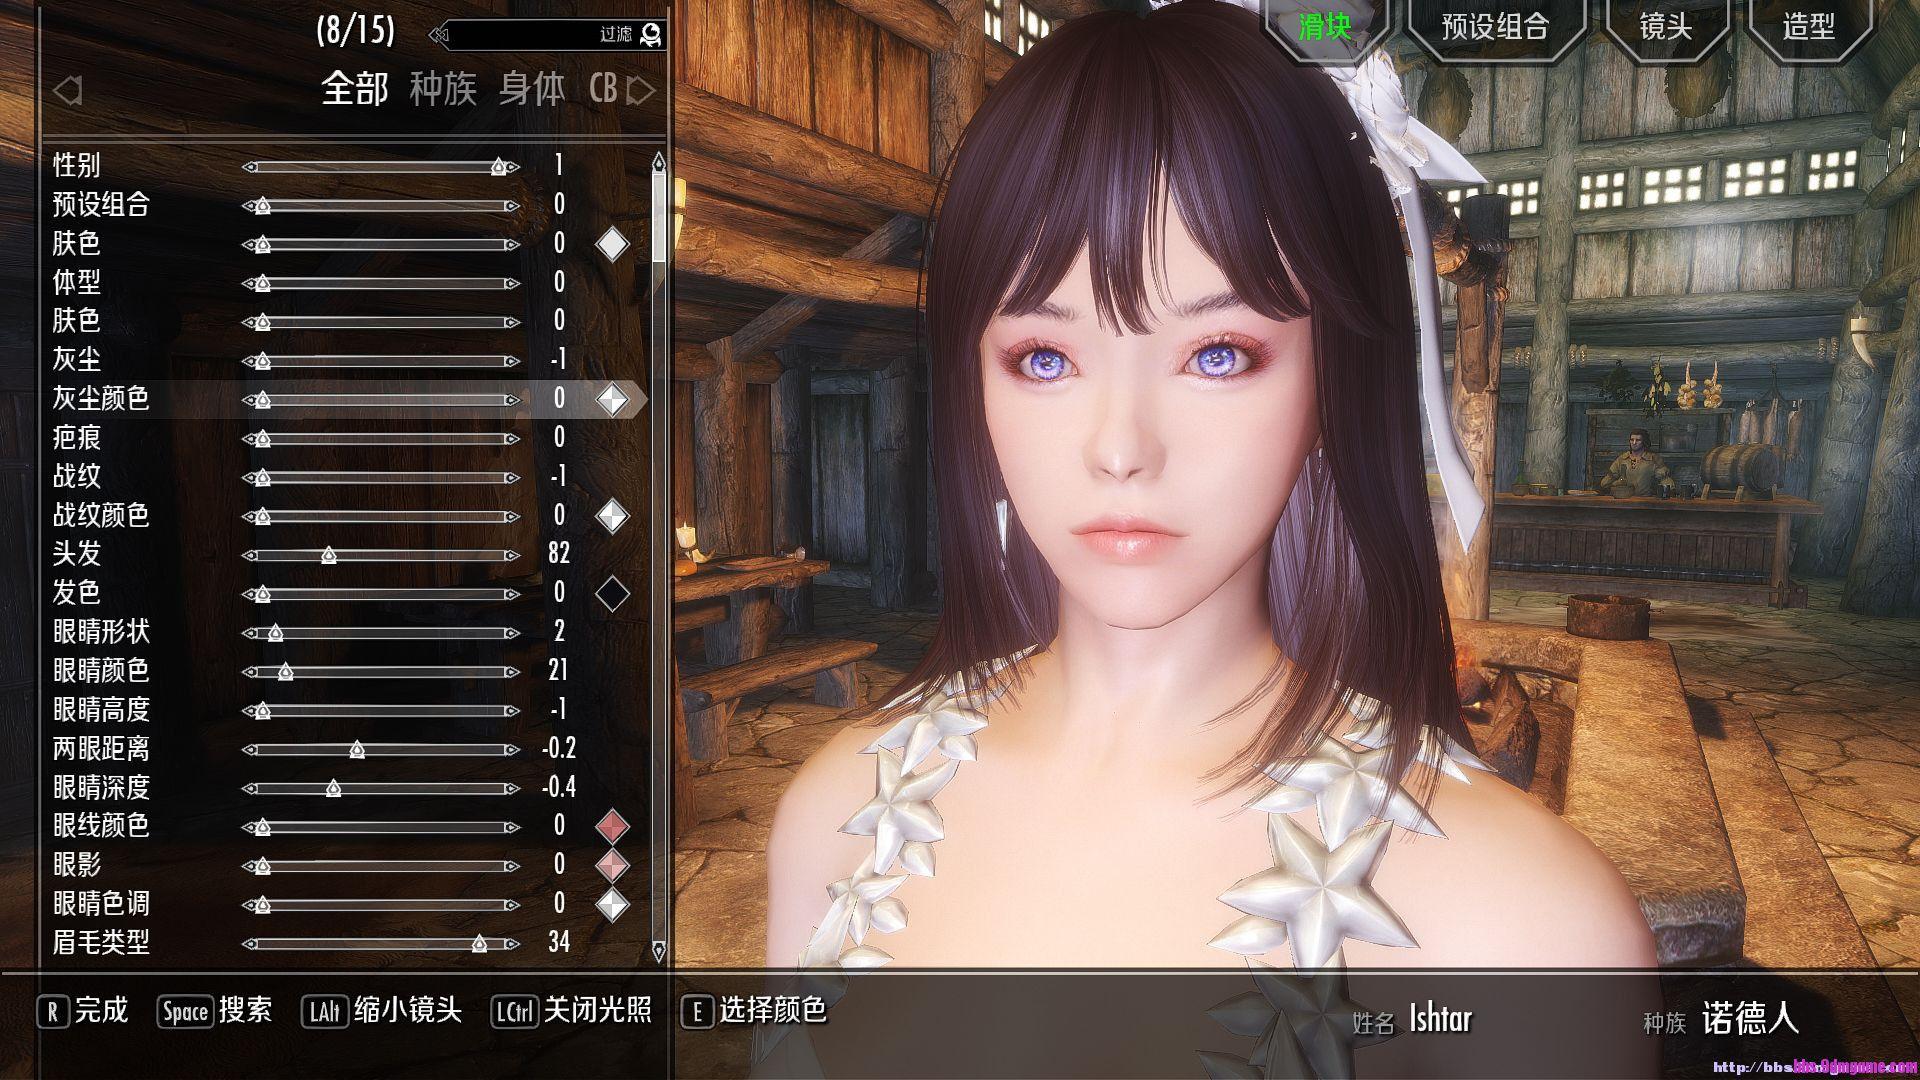 【3D/RPG/汉化】少女卷轴5:HXCY最终整合版 Ver6.5+视频安装教程【新整合】【100G】